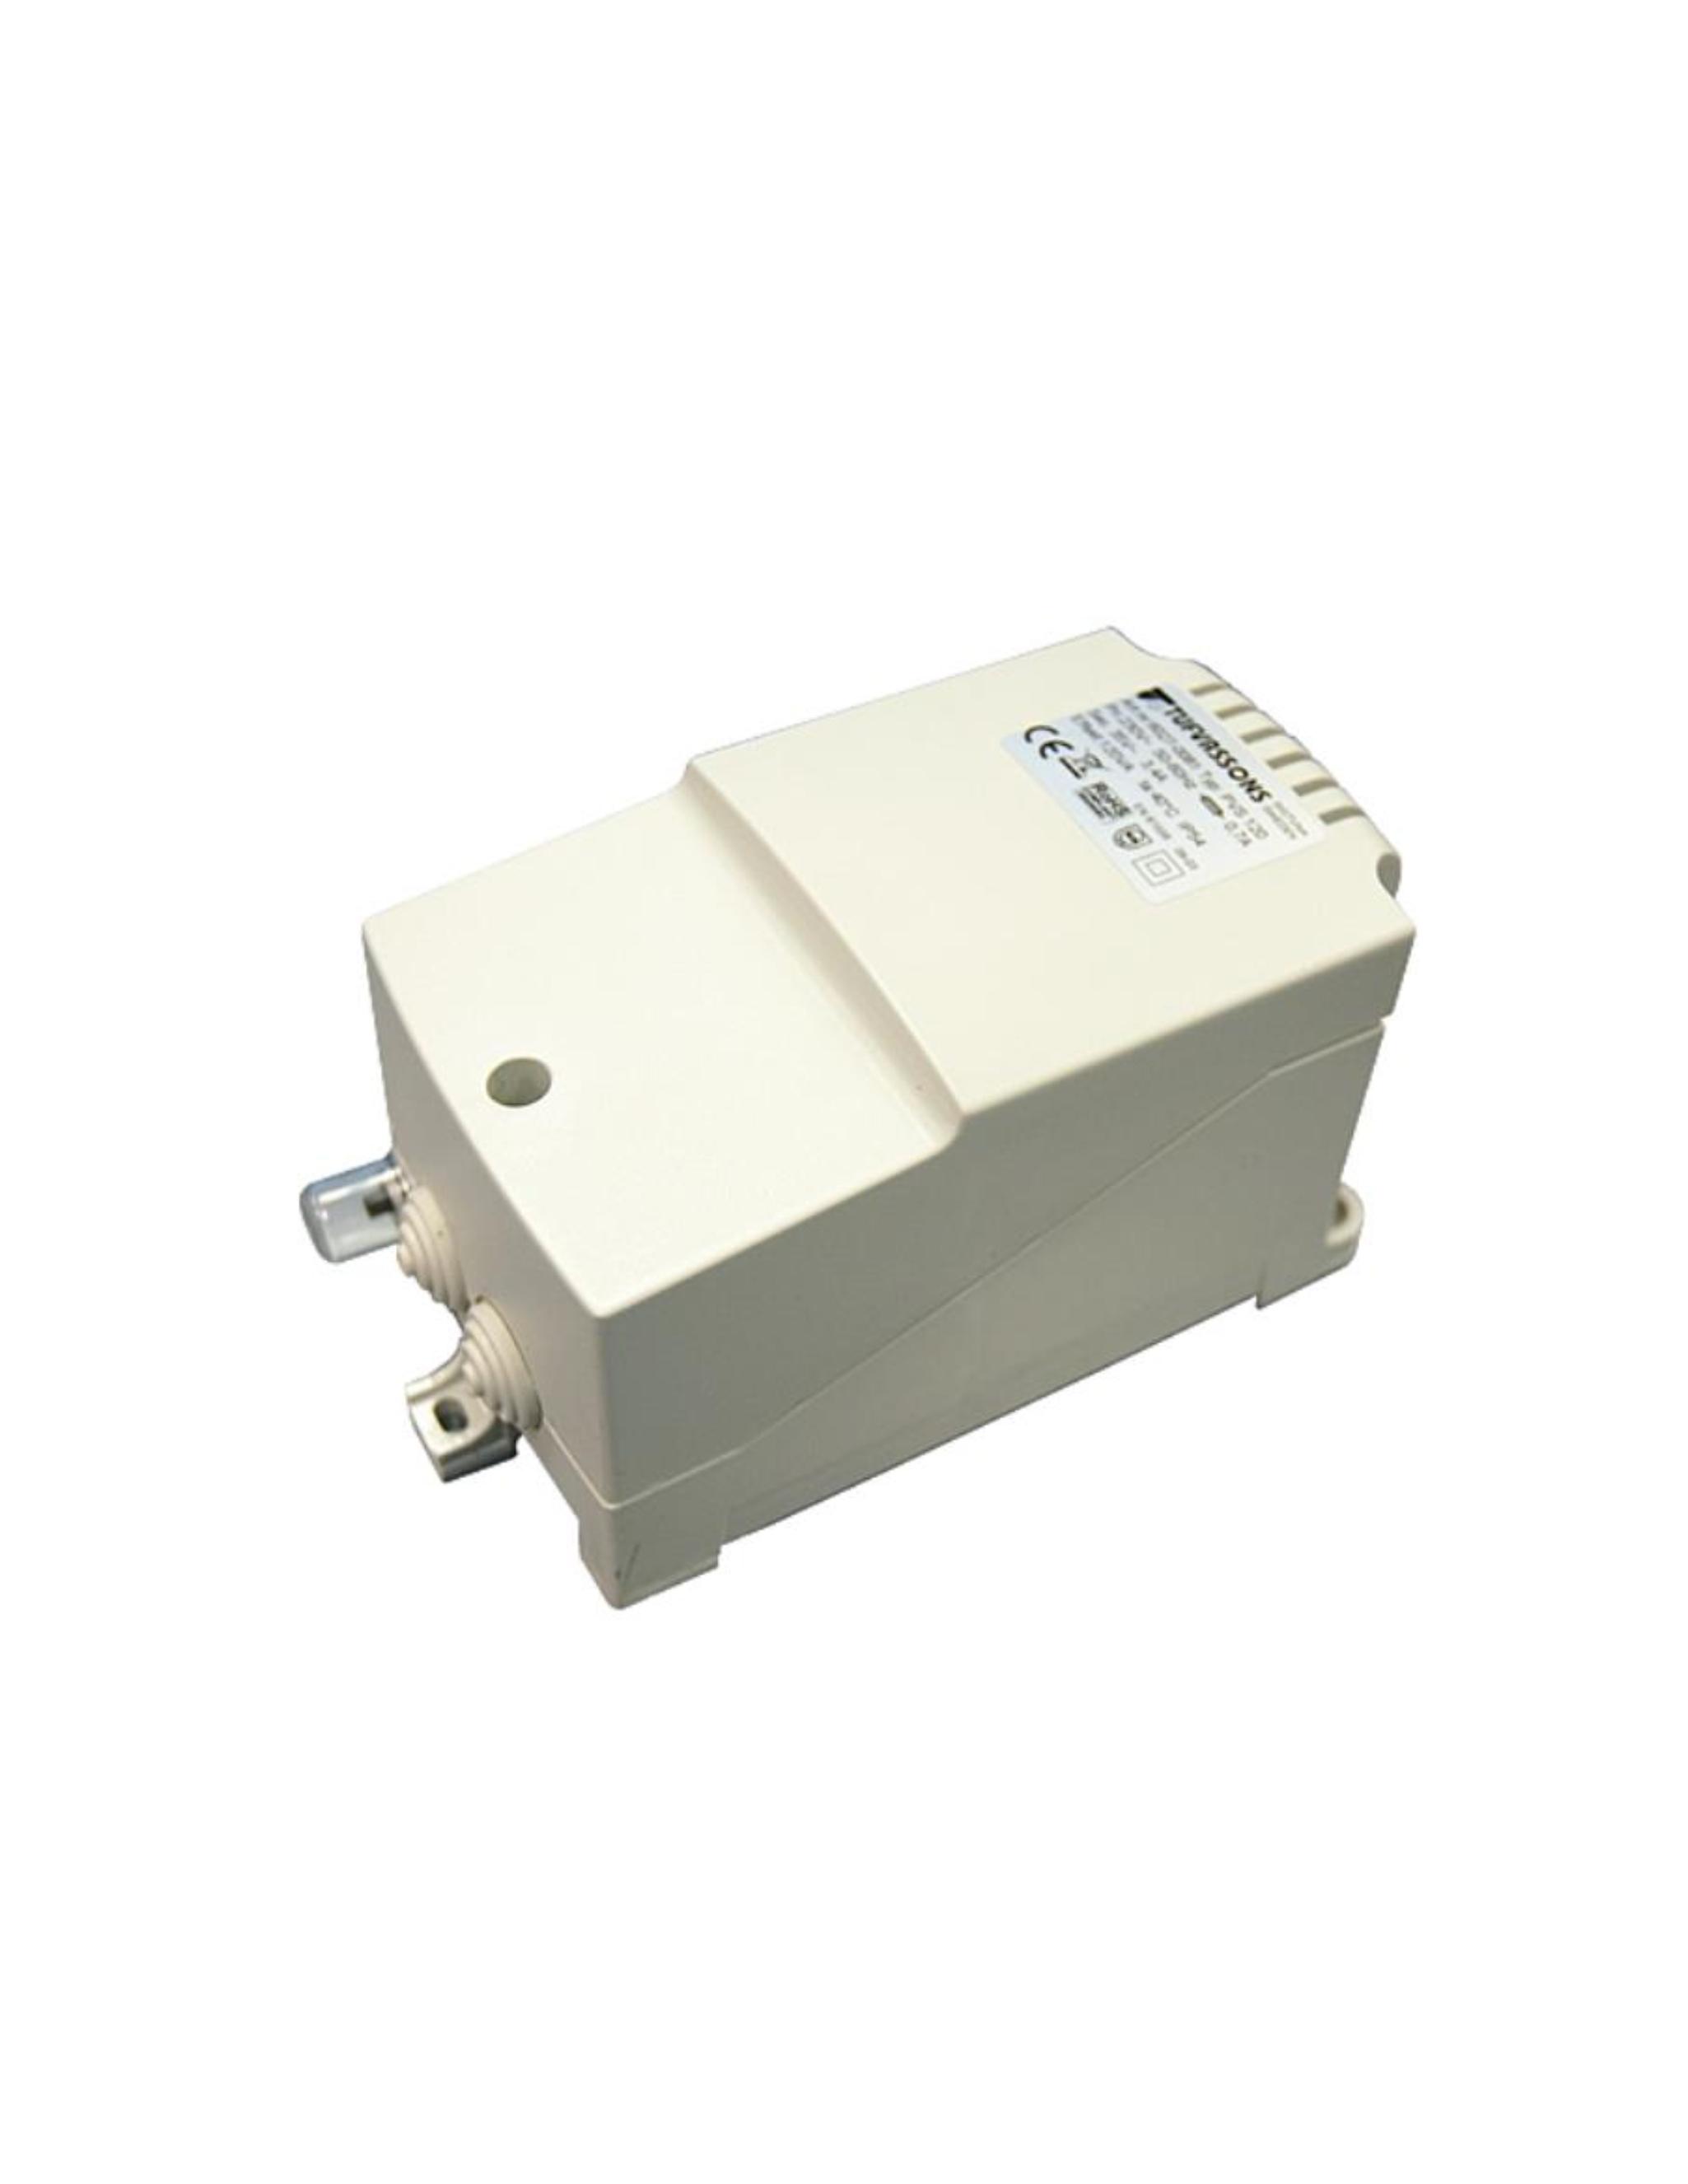 FIREscape Transformer 1400270-00